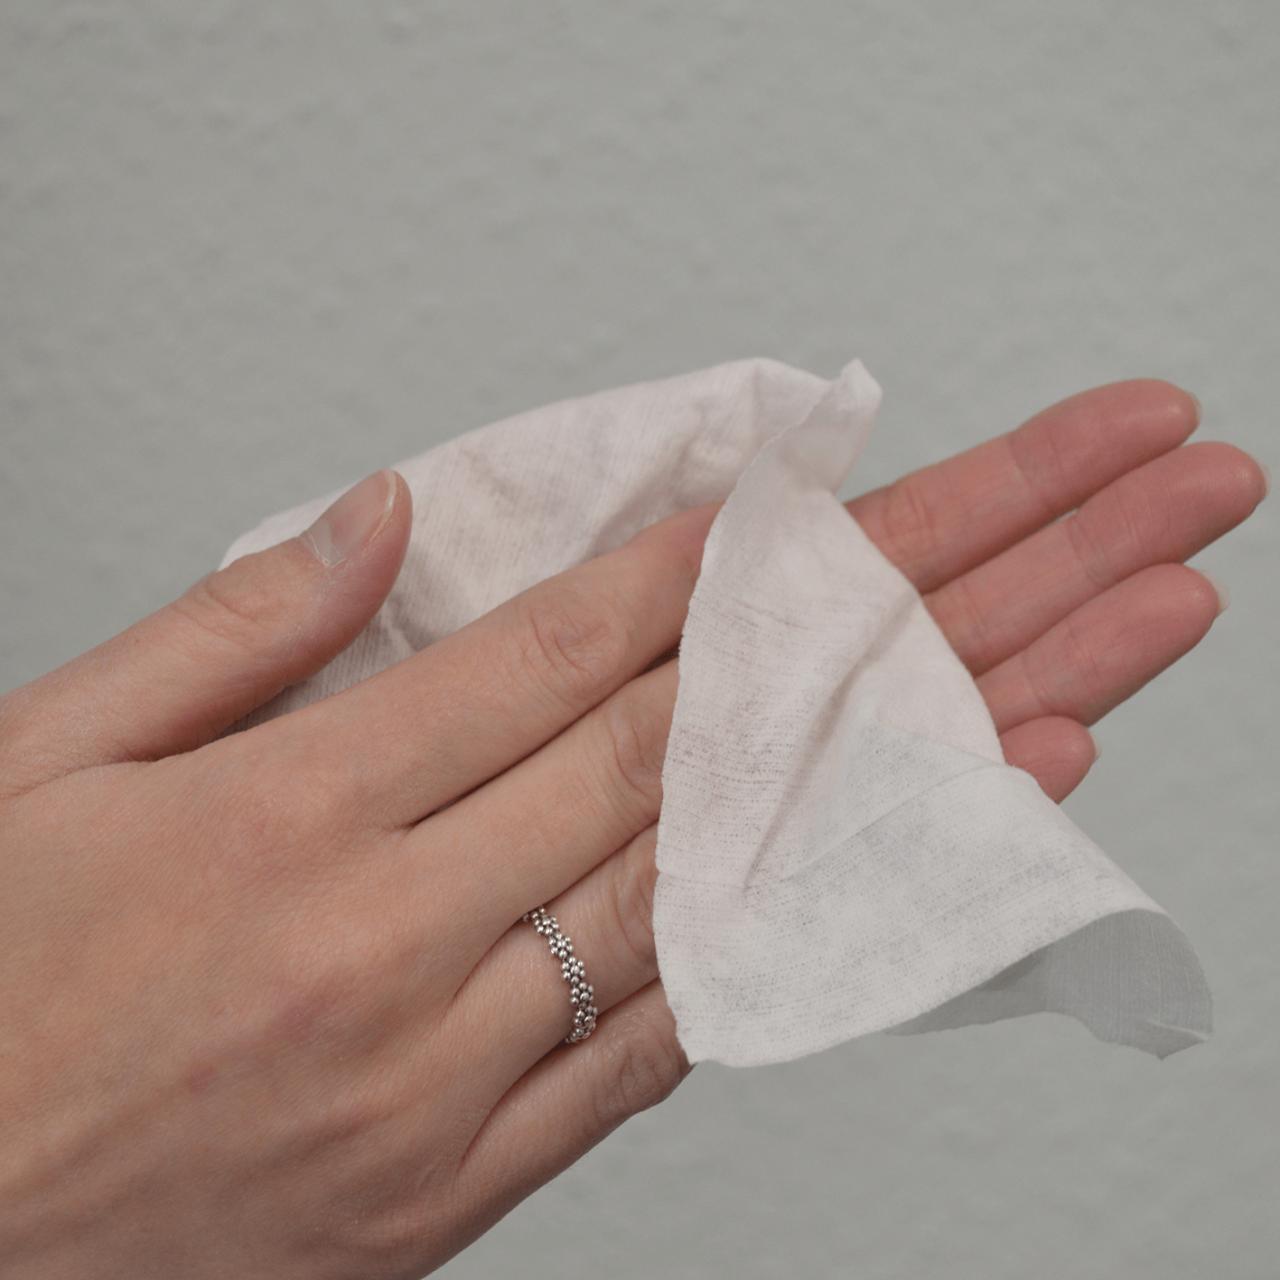 Desinfektionstücher Dictum soft-wipe (MB 6) Bild 2